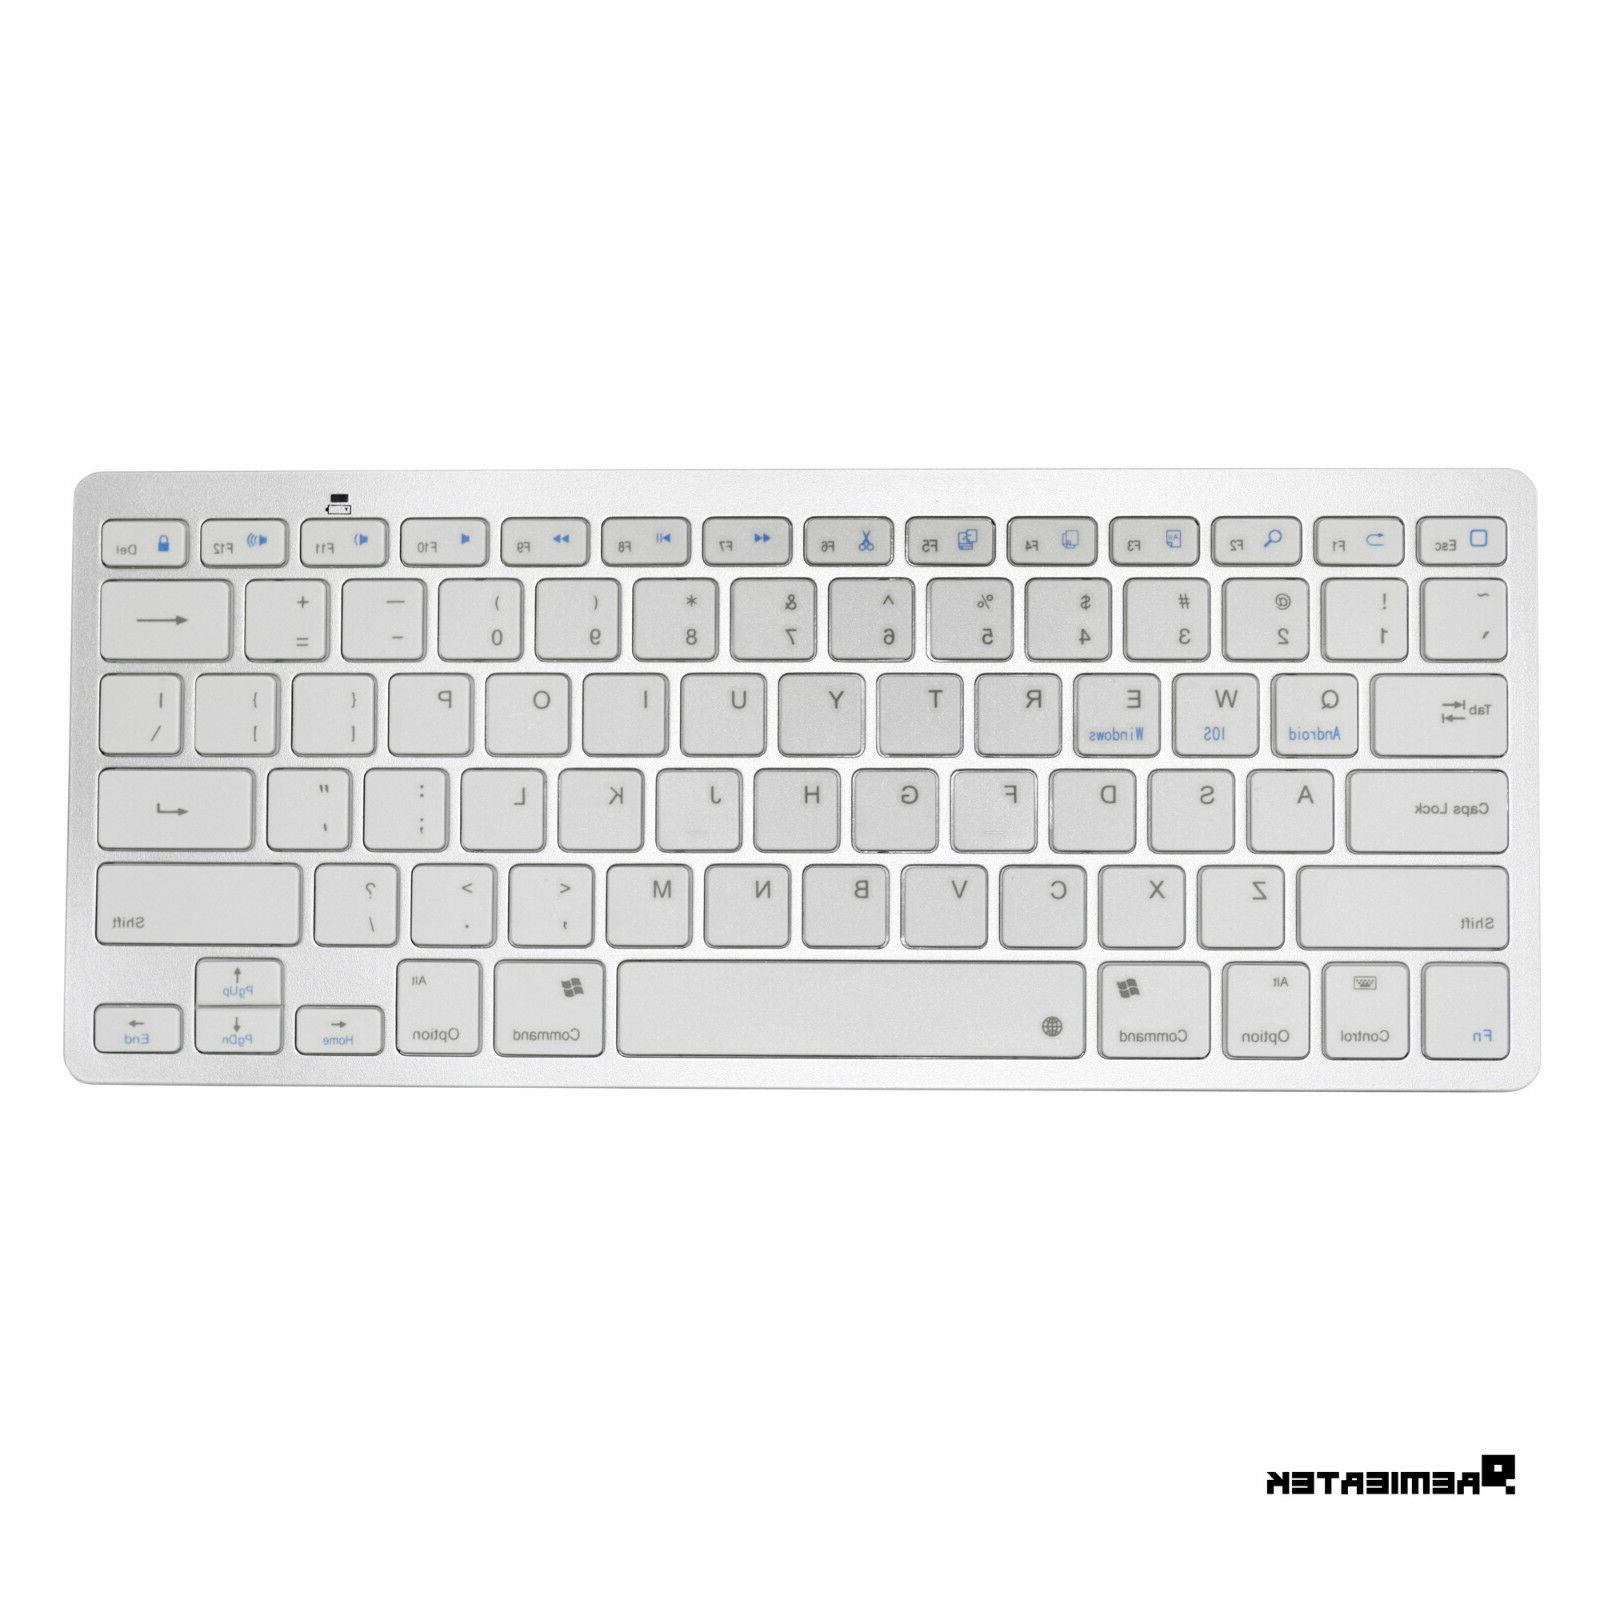 Premiertek Wireless Bluetooth V3.0 Slim Keyboard for PC/MAC/